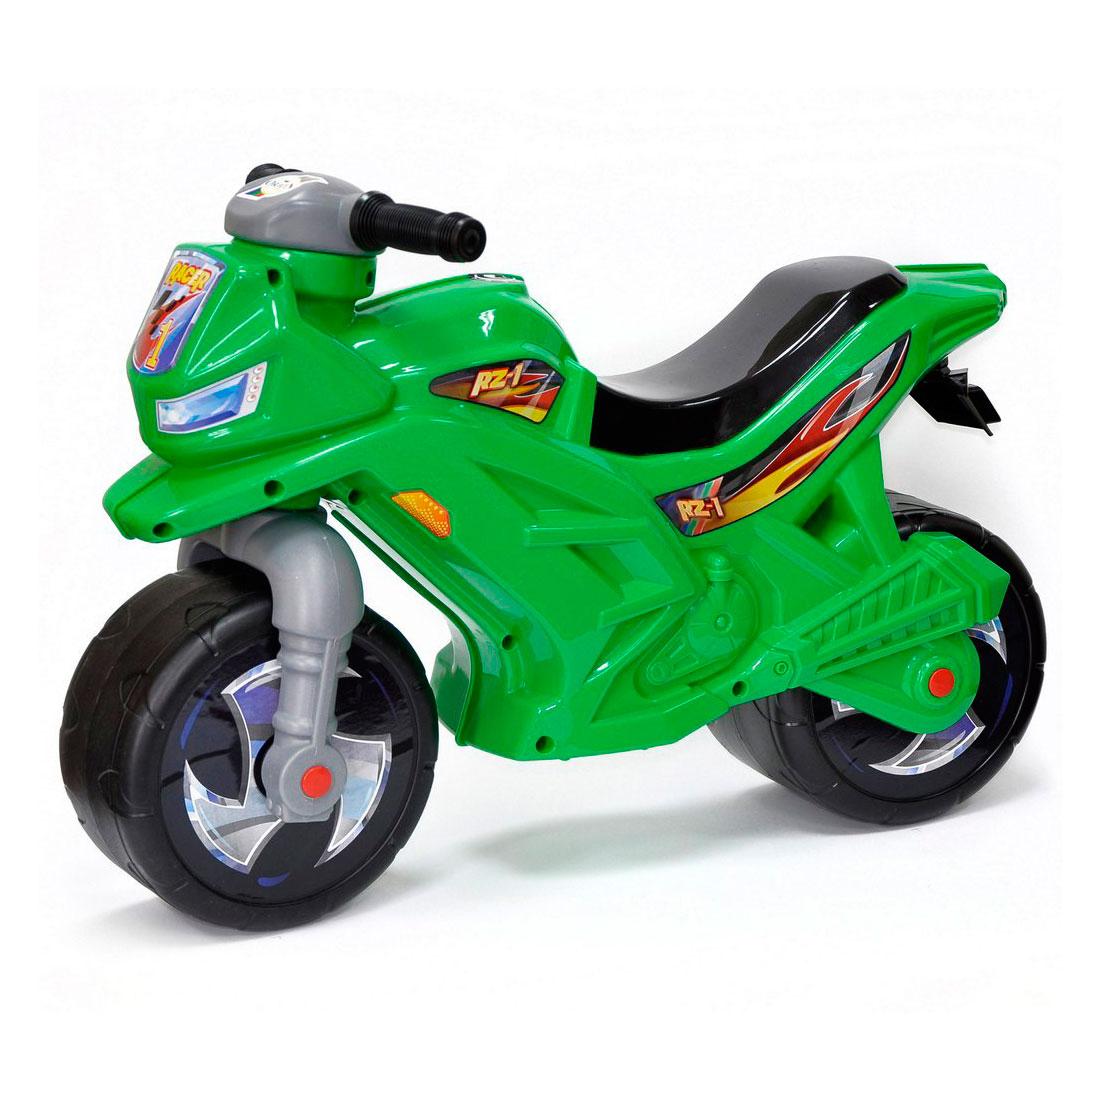 Каталка-беговел RT Racer RZ 1 ОР501 Зеленая<br>